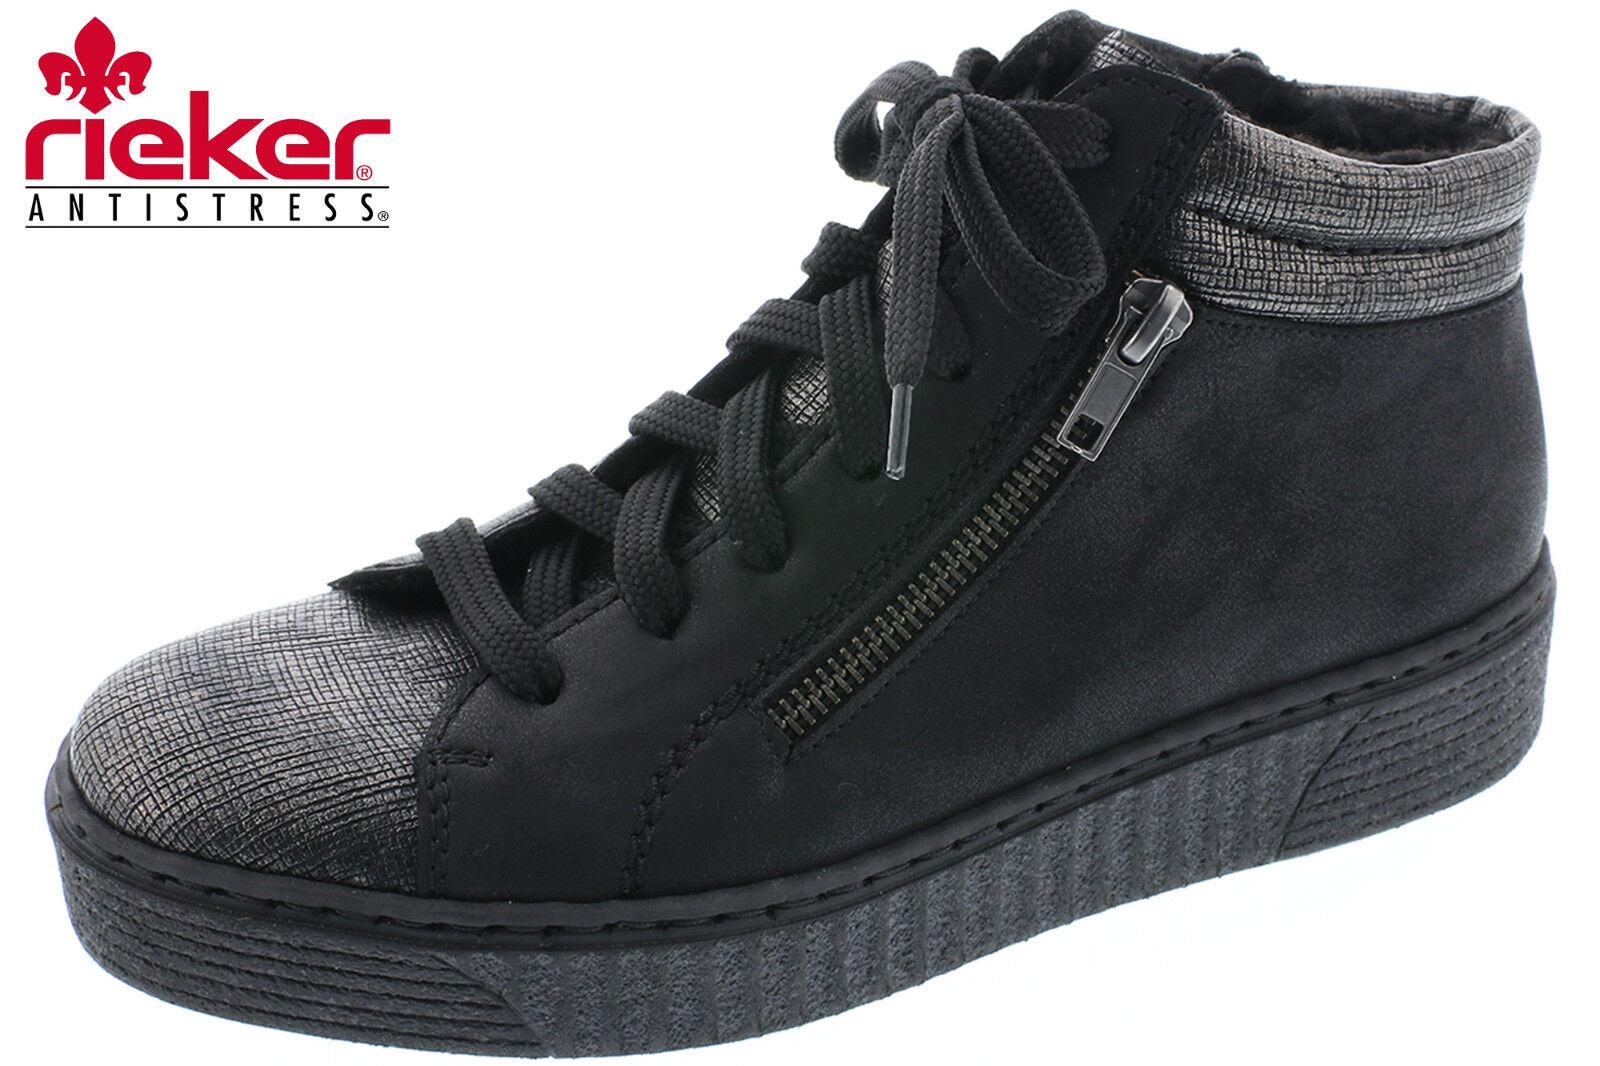 Rieker Damen Hohe Sneaker Schwarz gefüttert Stiefel Leder Optik 51611-45 NEU